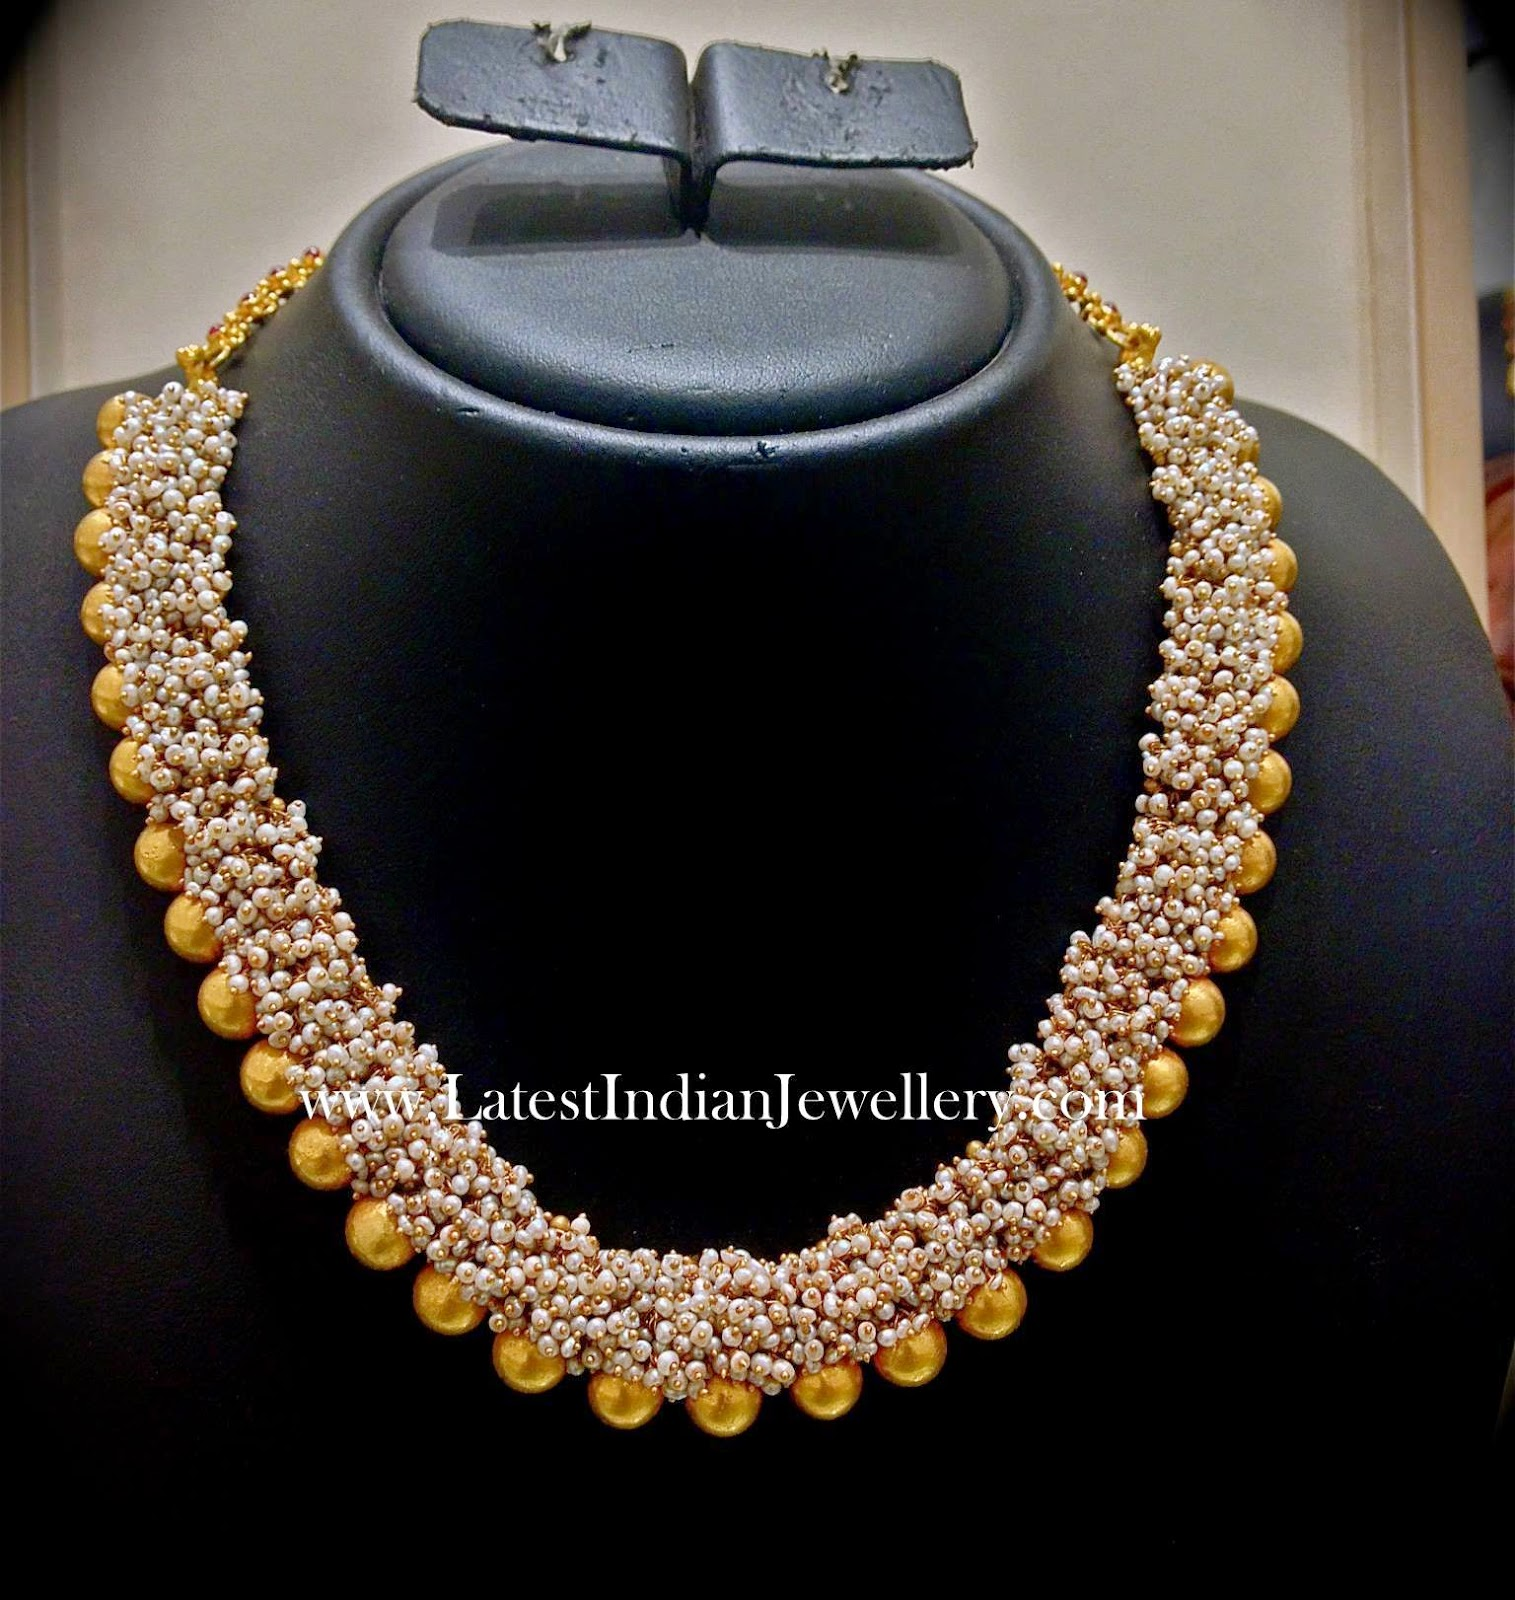 Basra Pearls Fancy Necklace